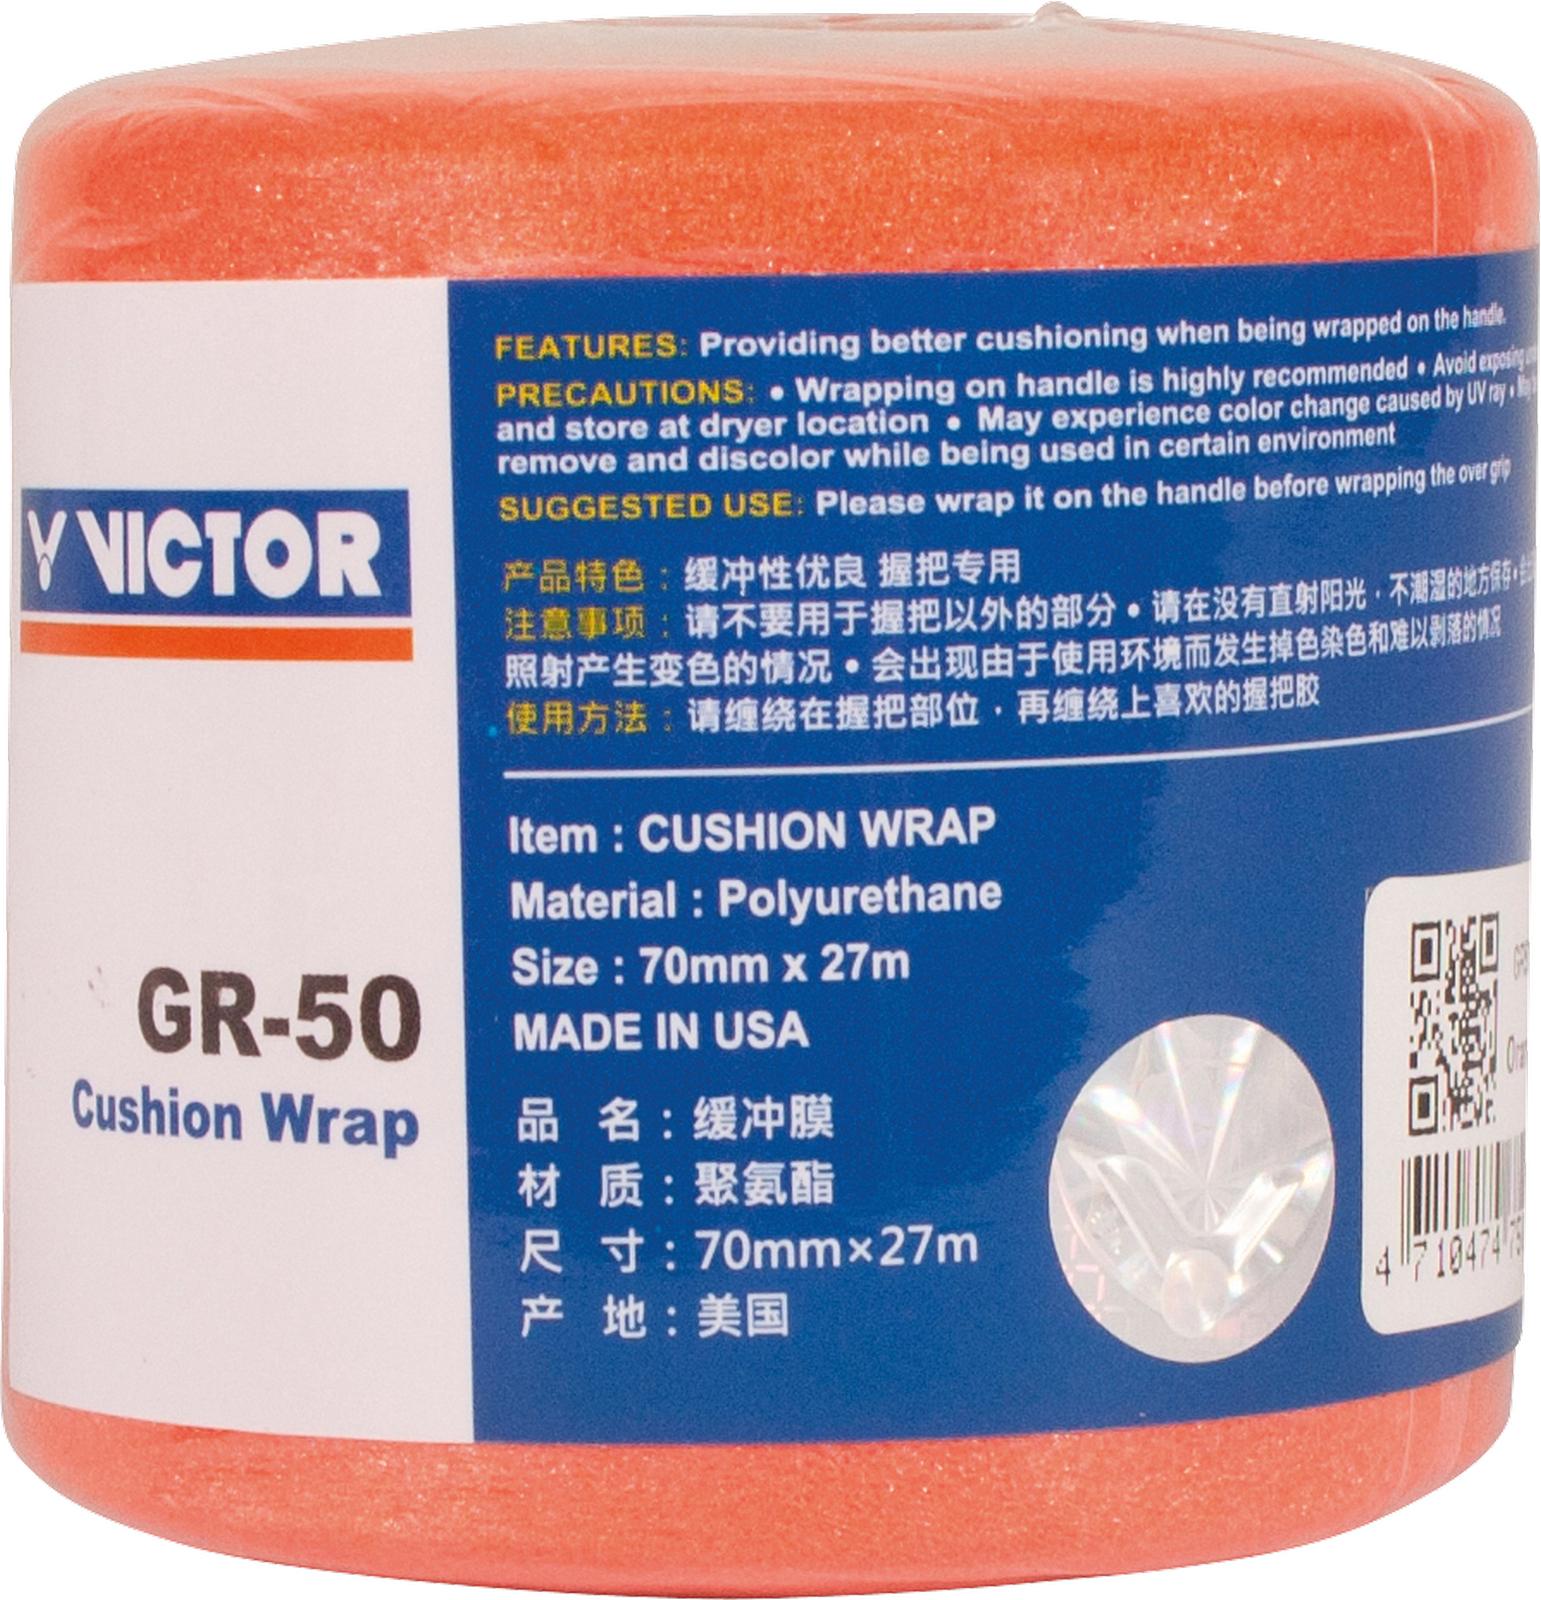 Victor Cushion Wrap